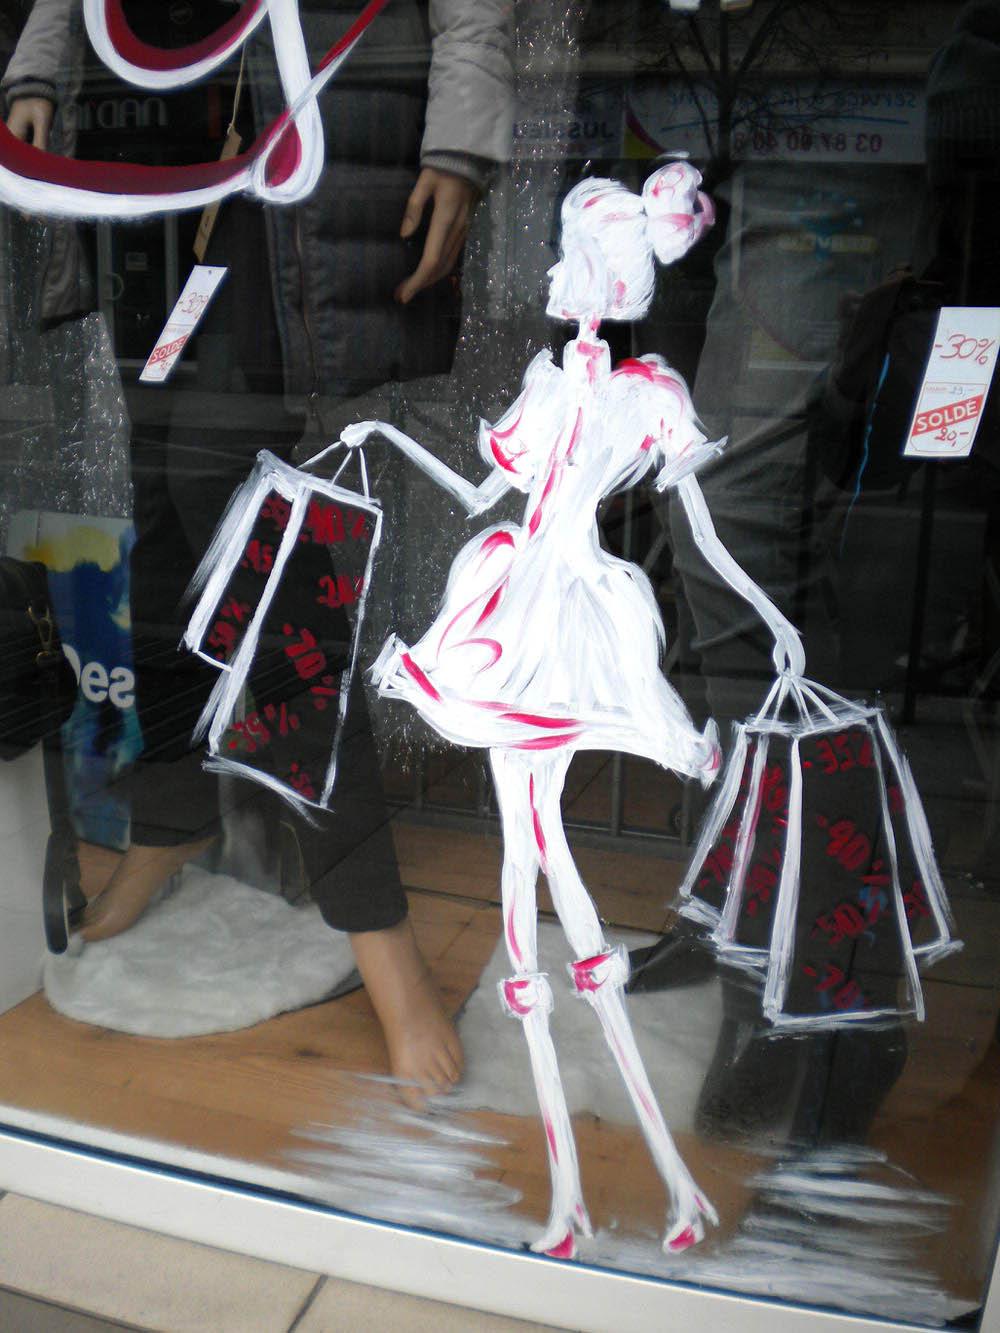 decoration-vitrine-peinture-soldes-magasin-sarreguemines-amelie-h-03